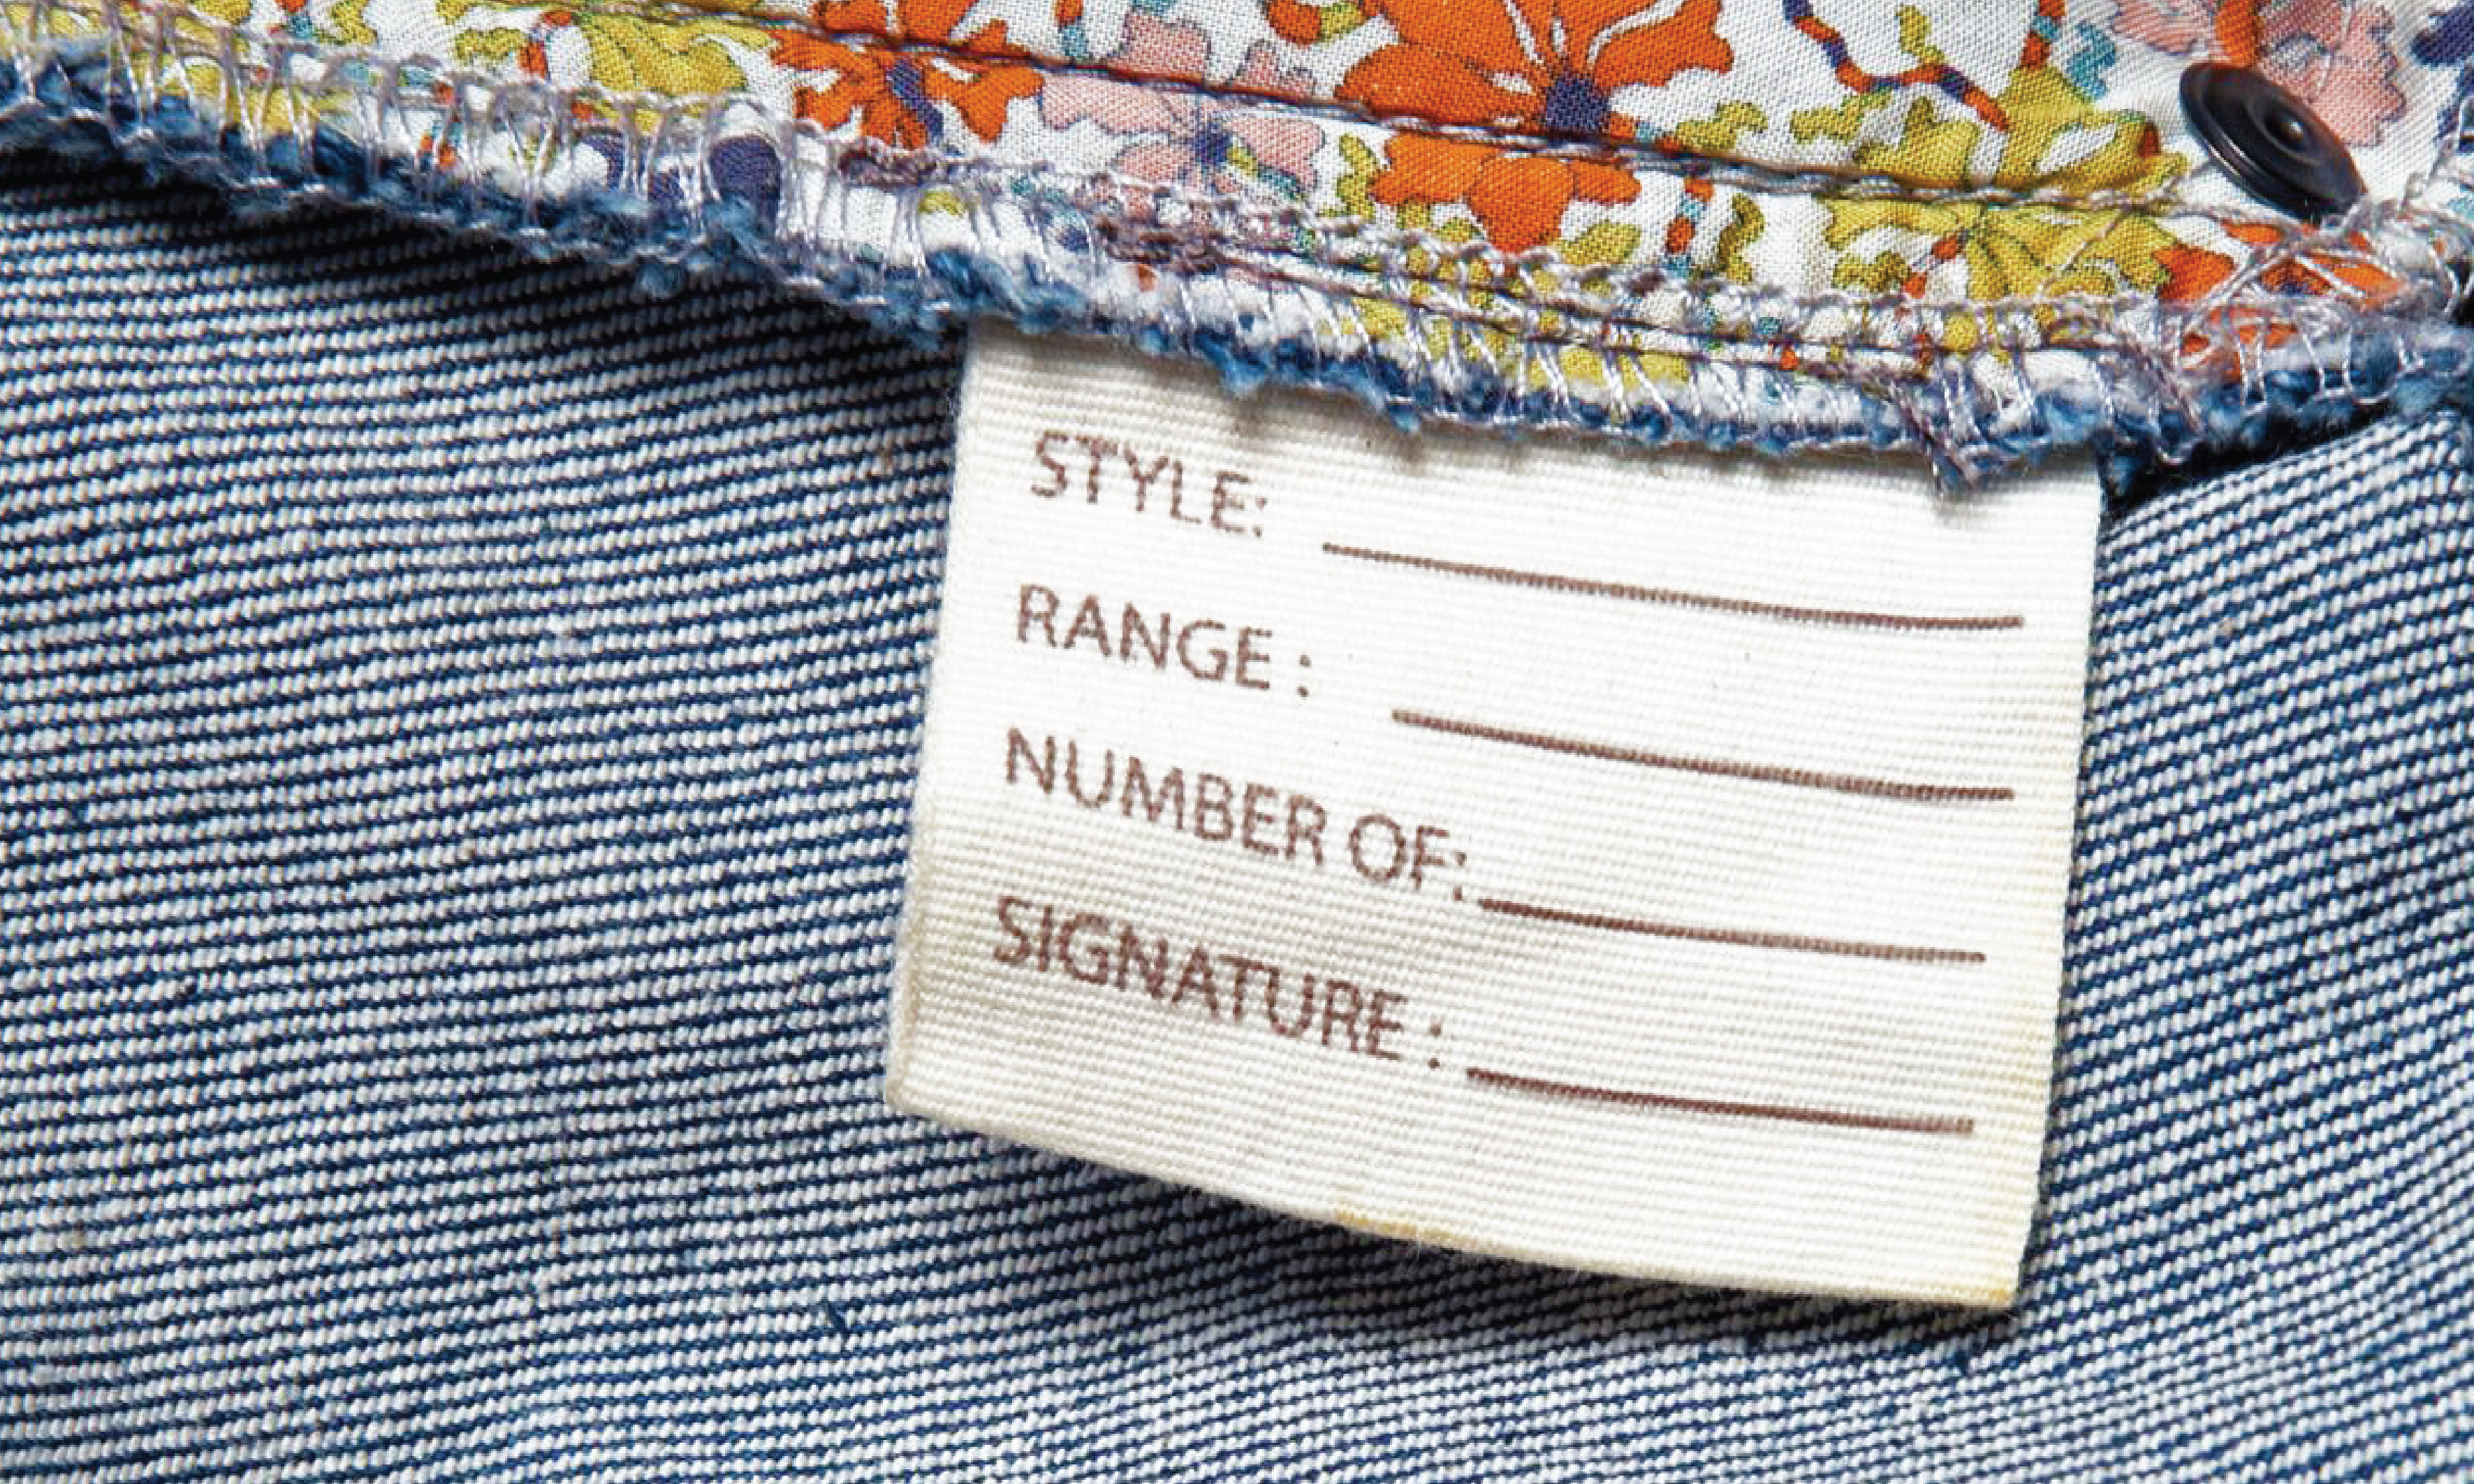 Okki Collective Limited Edition denim jeans